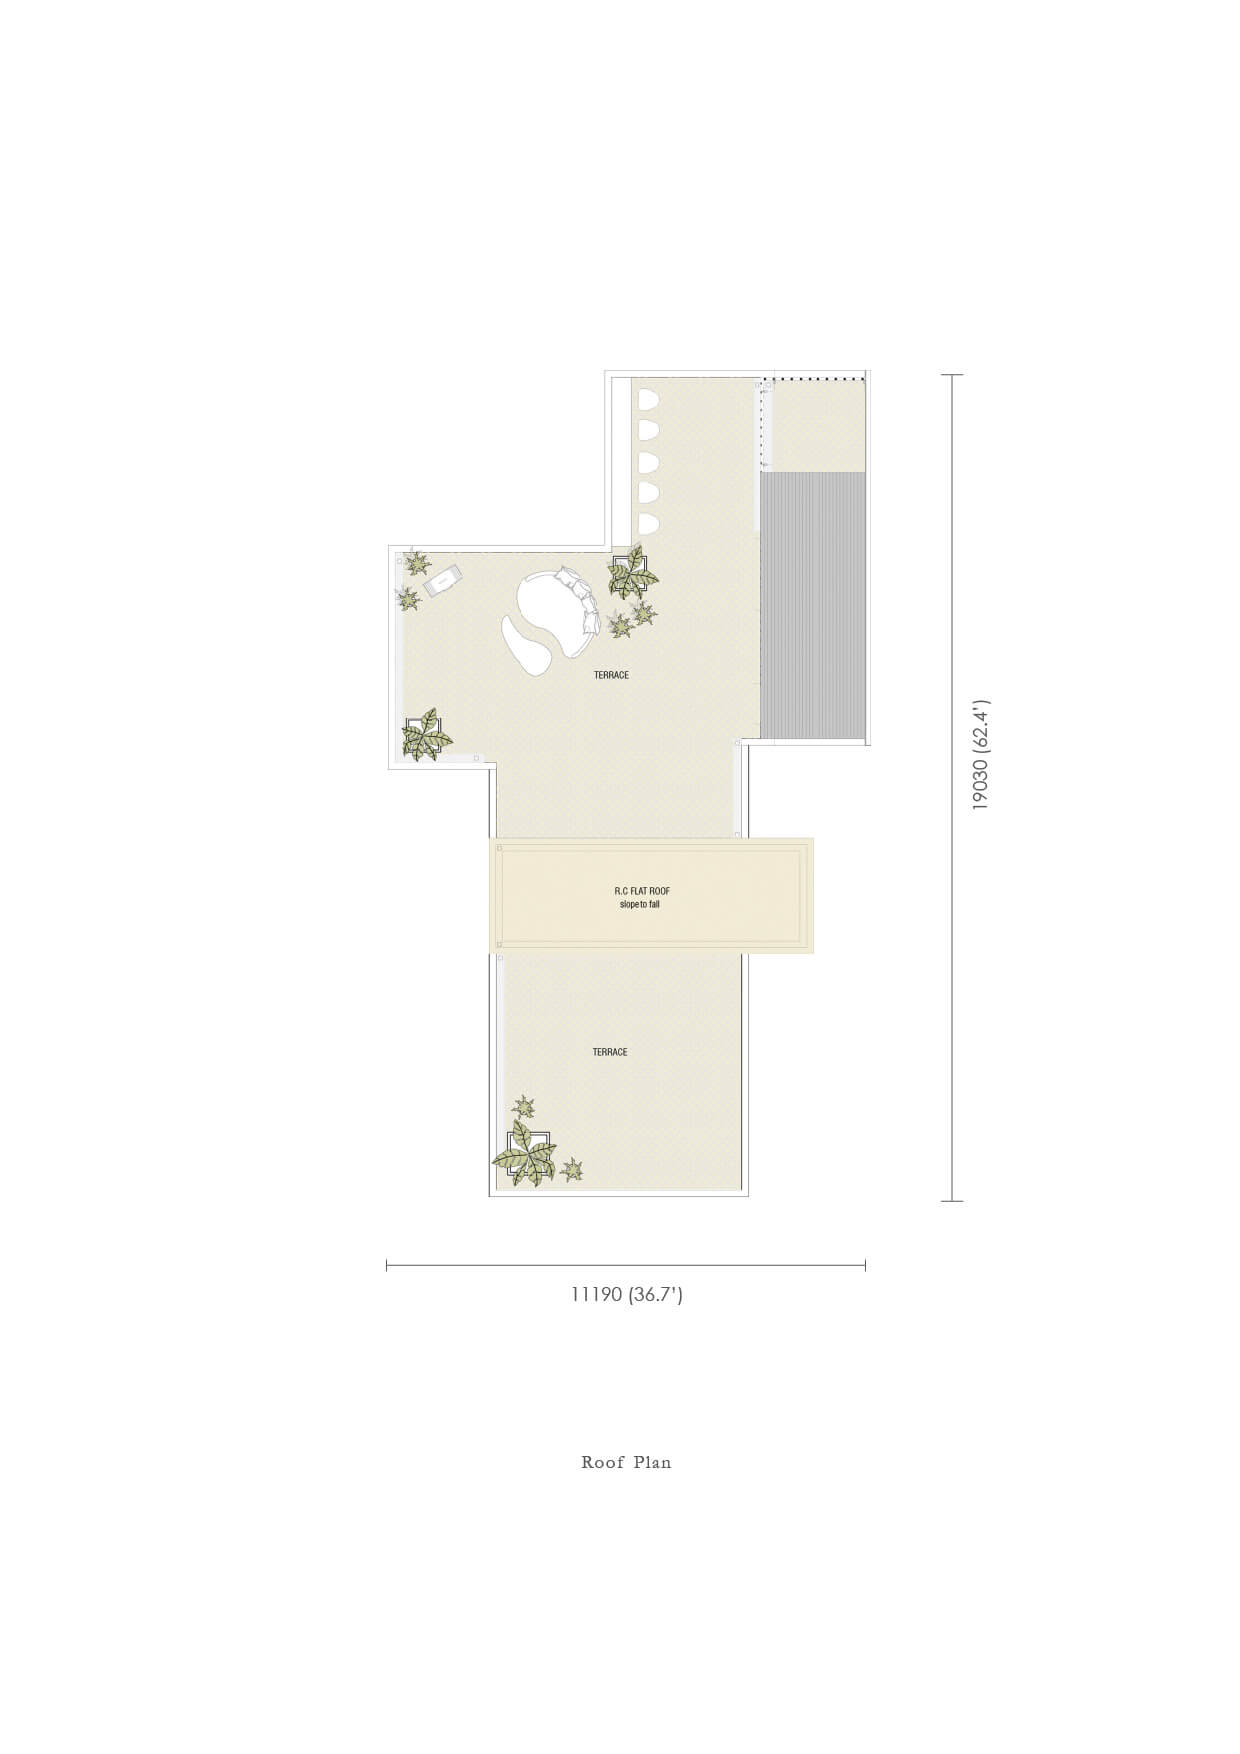 roof-plan-01